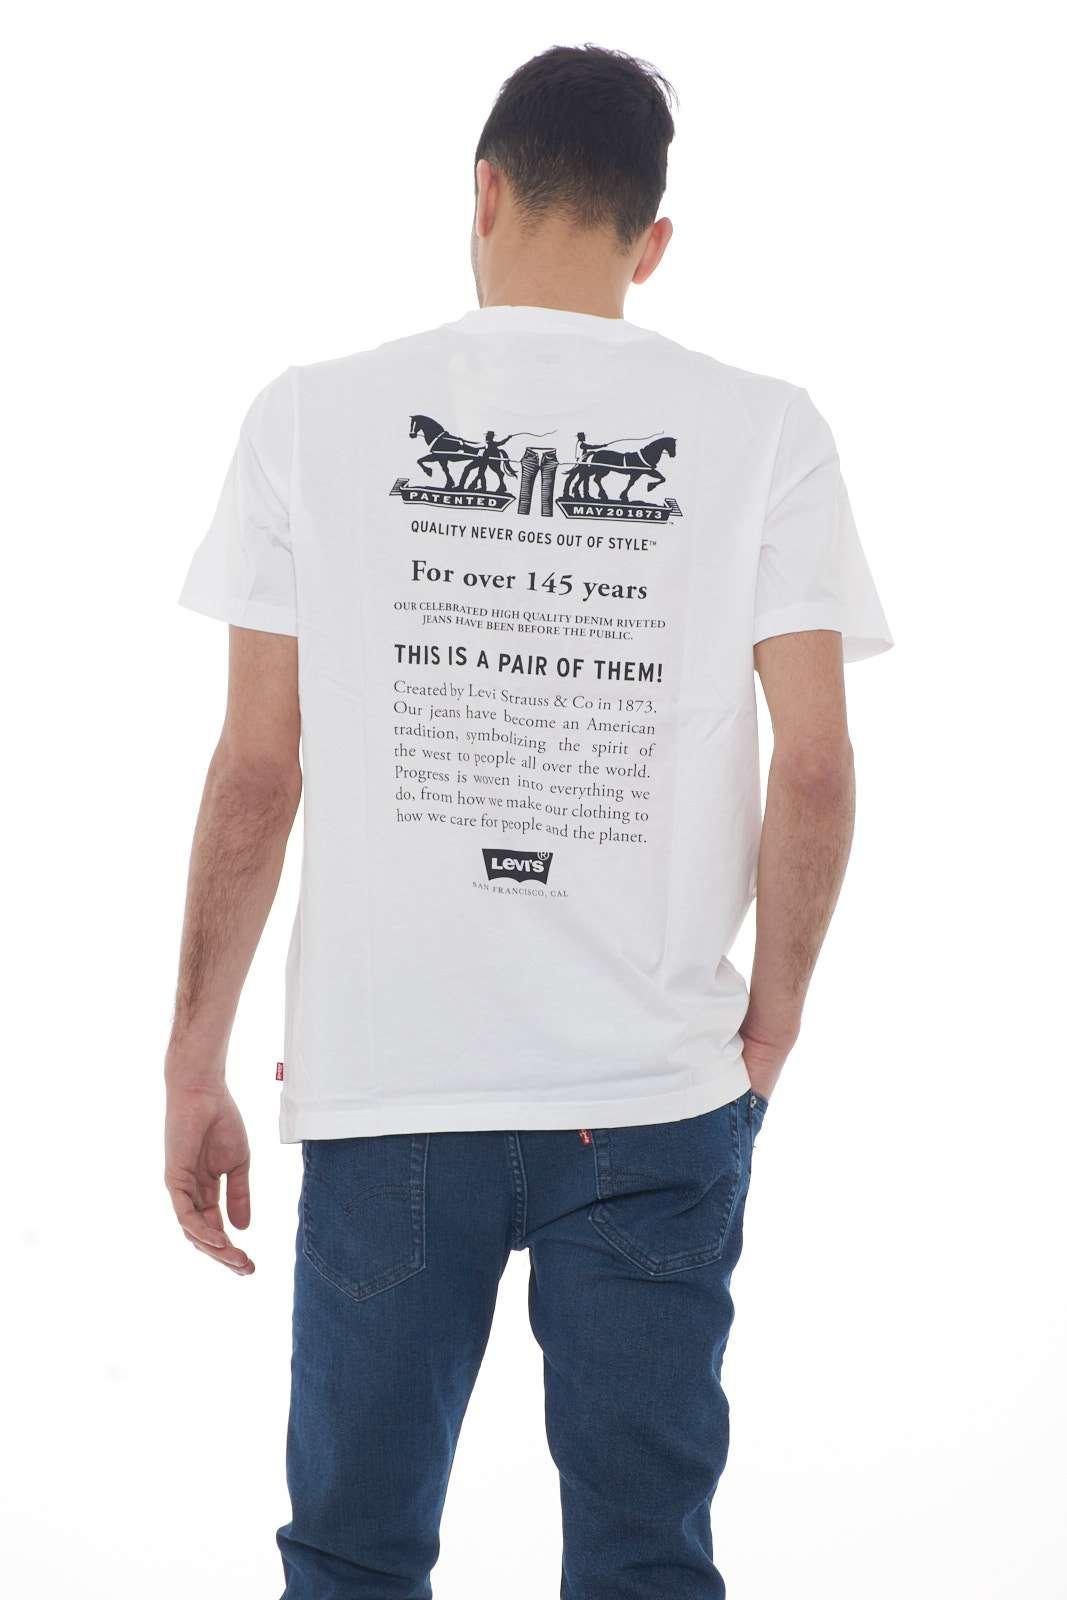 https://www.parmax.com/media/catalog/product/a/i/PE-outlet_parmax-t-shirt-uomo-Levis-699780032-C.jpg